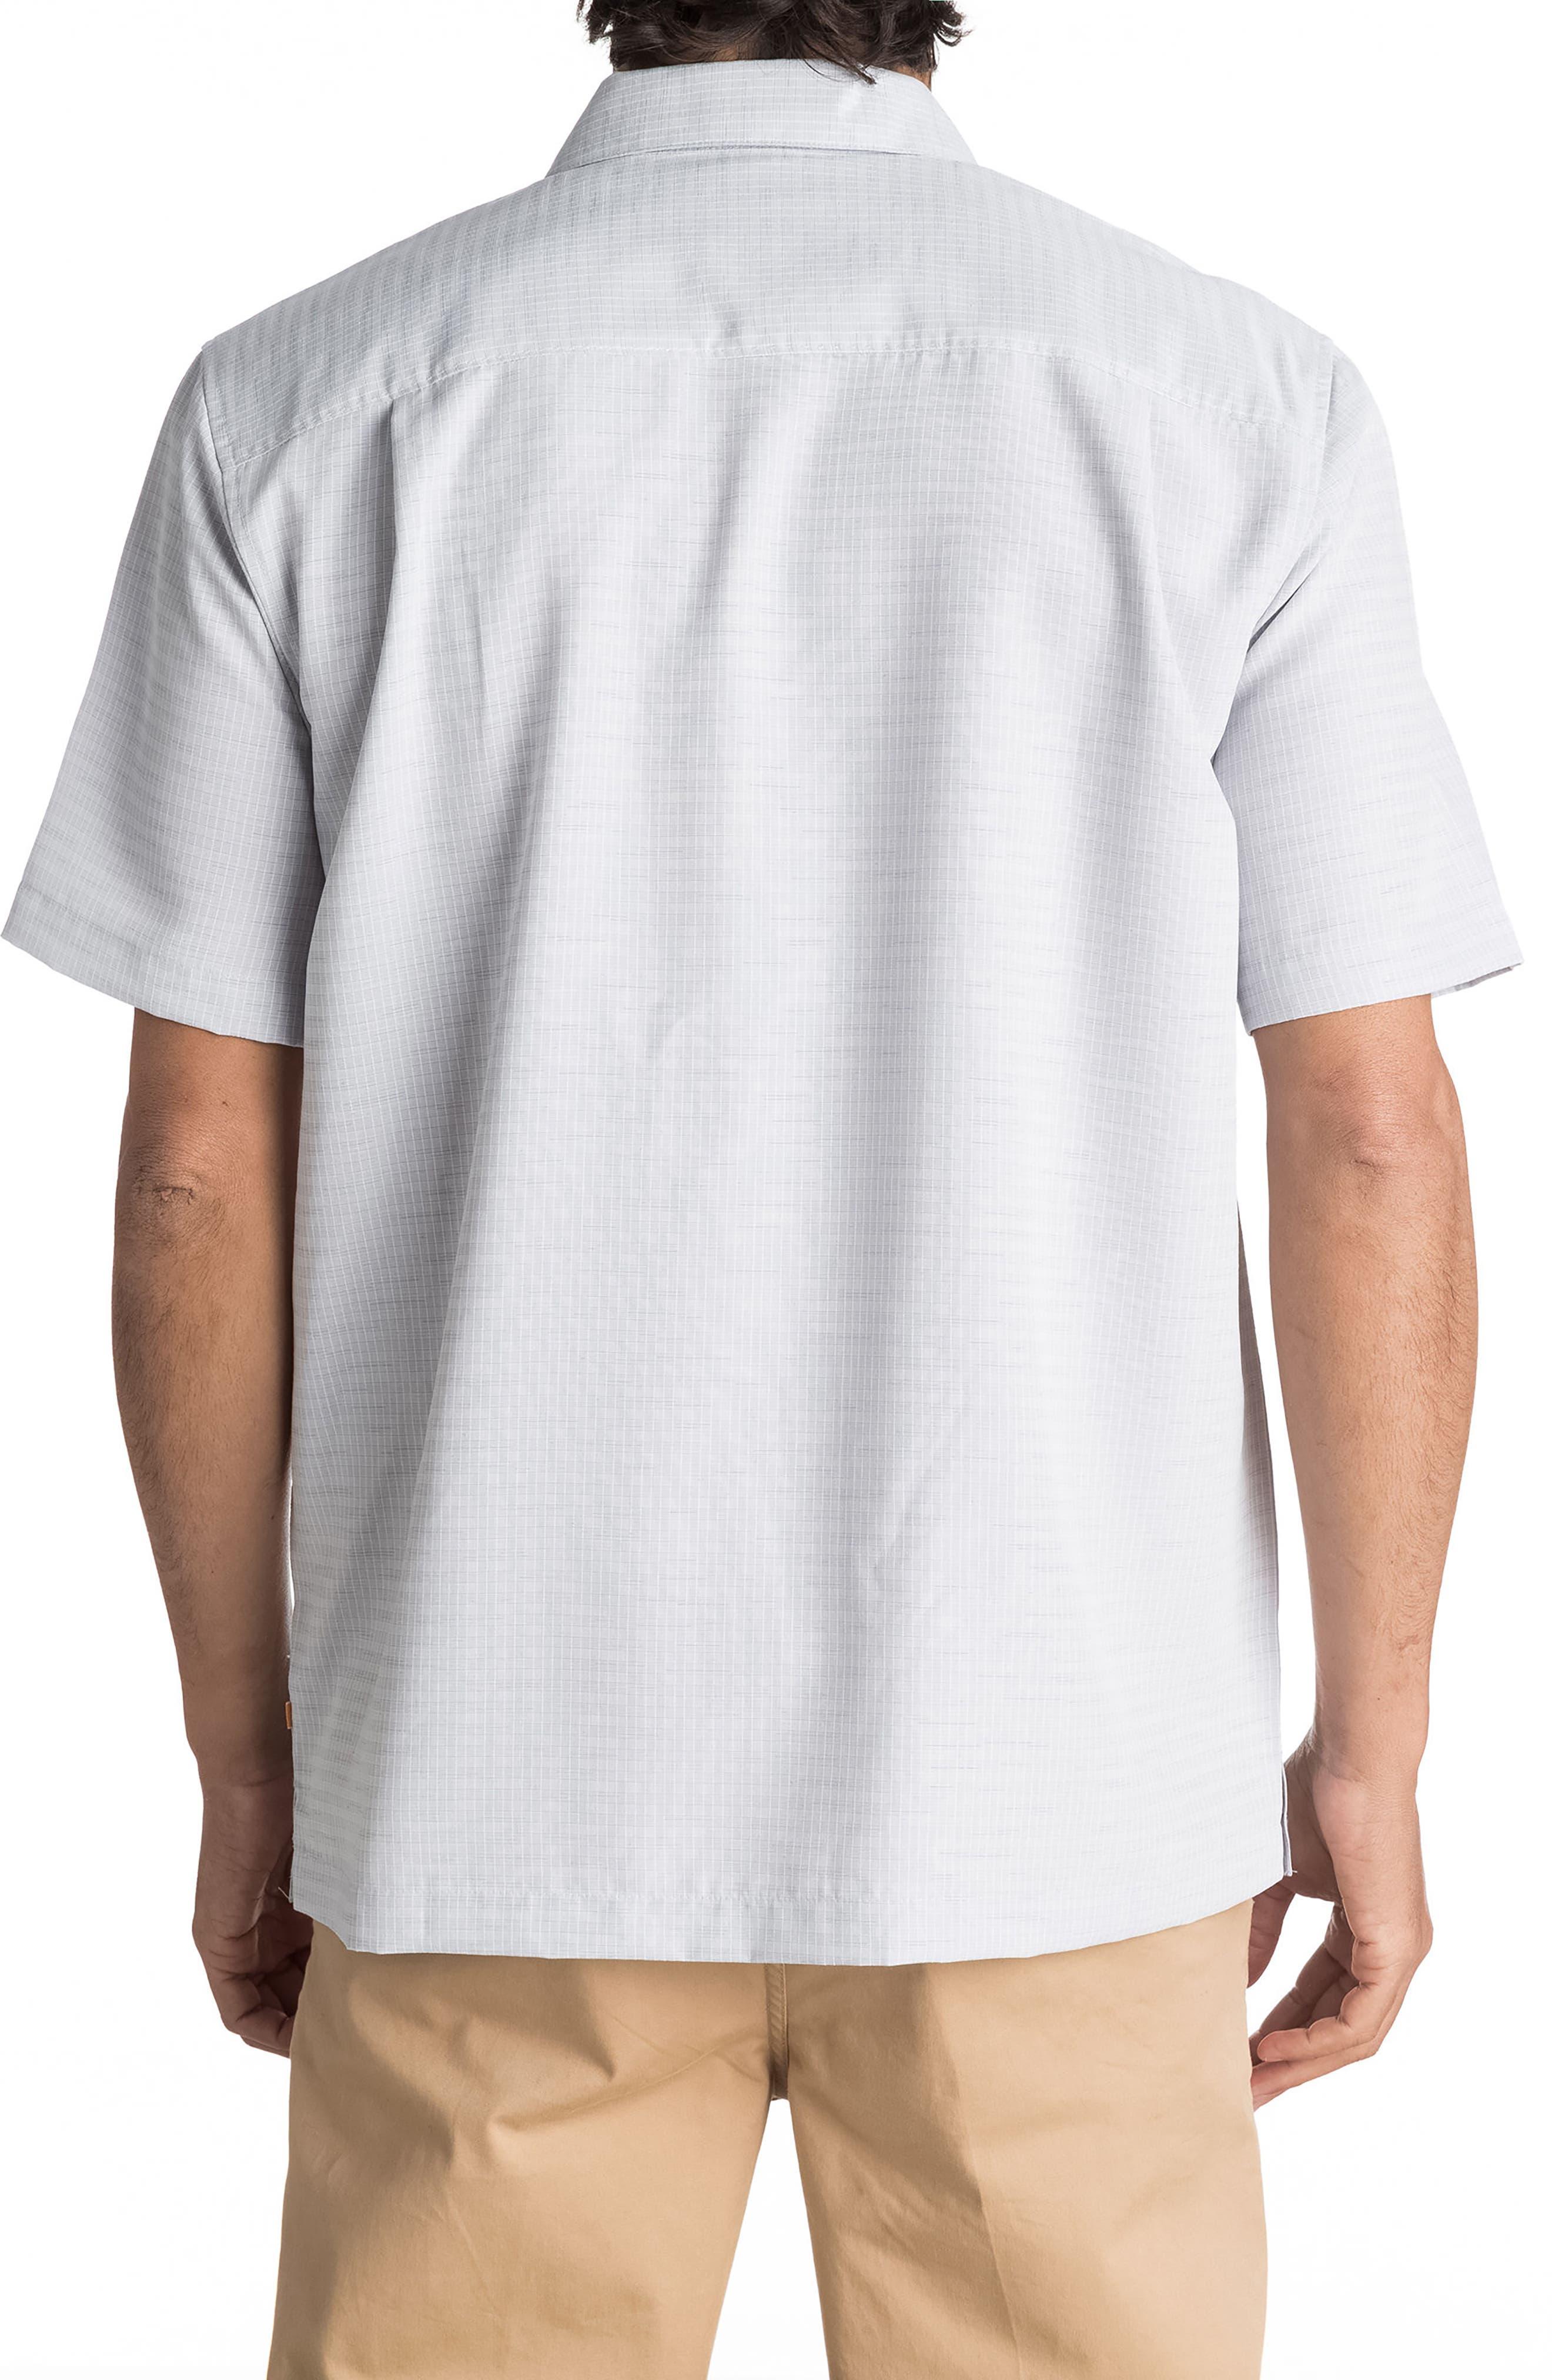 'Centinela 4' Short Sleeve Sport Shirt,                             Alternate thumbnail 2, color,                             028